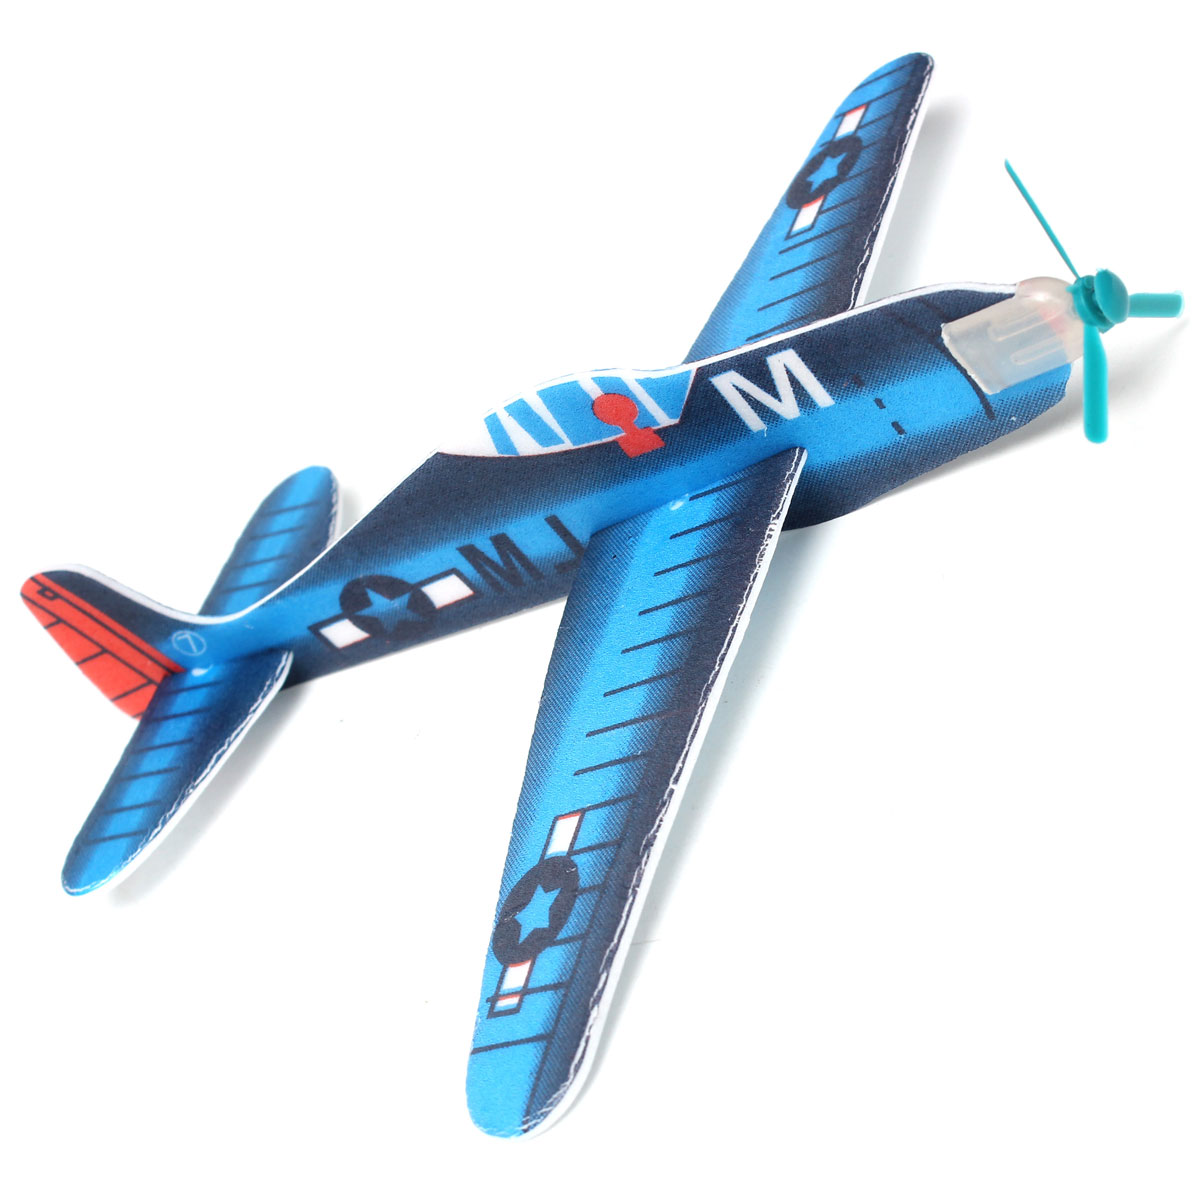 DIY Flying Glider Planes - KidsBaron